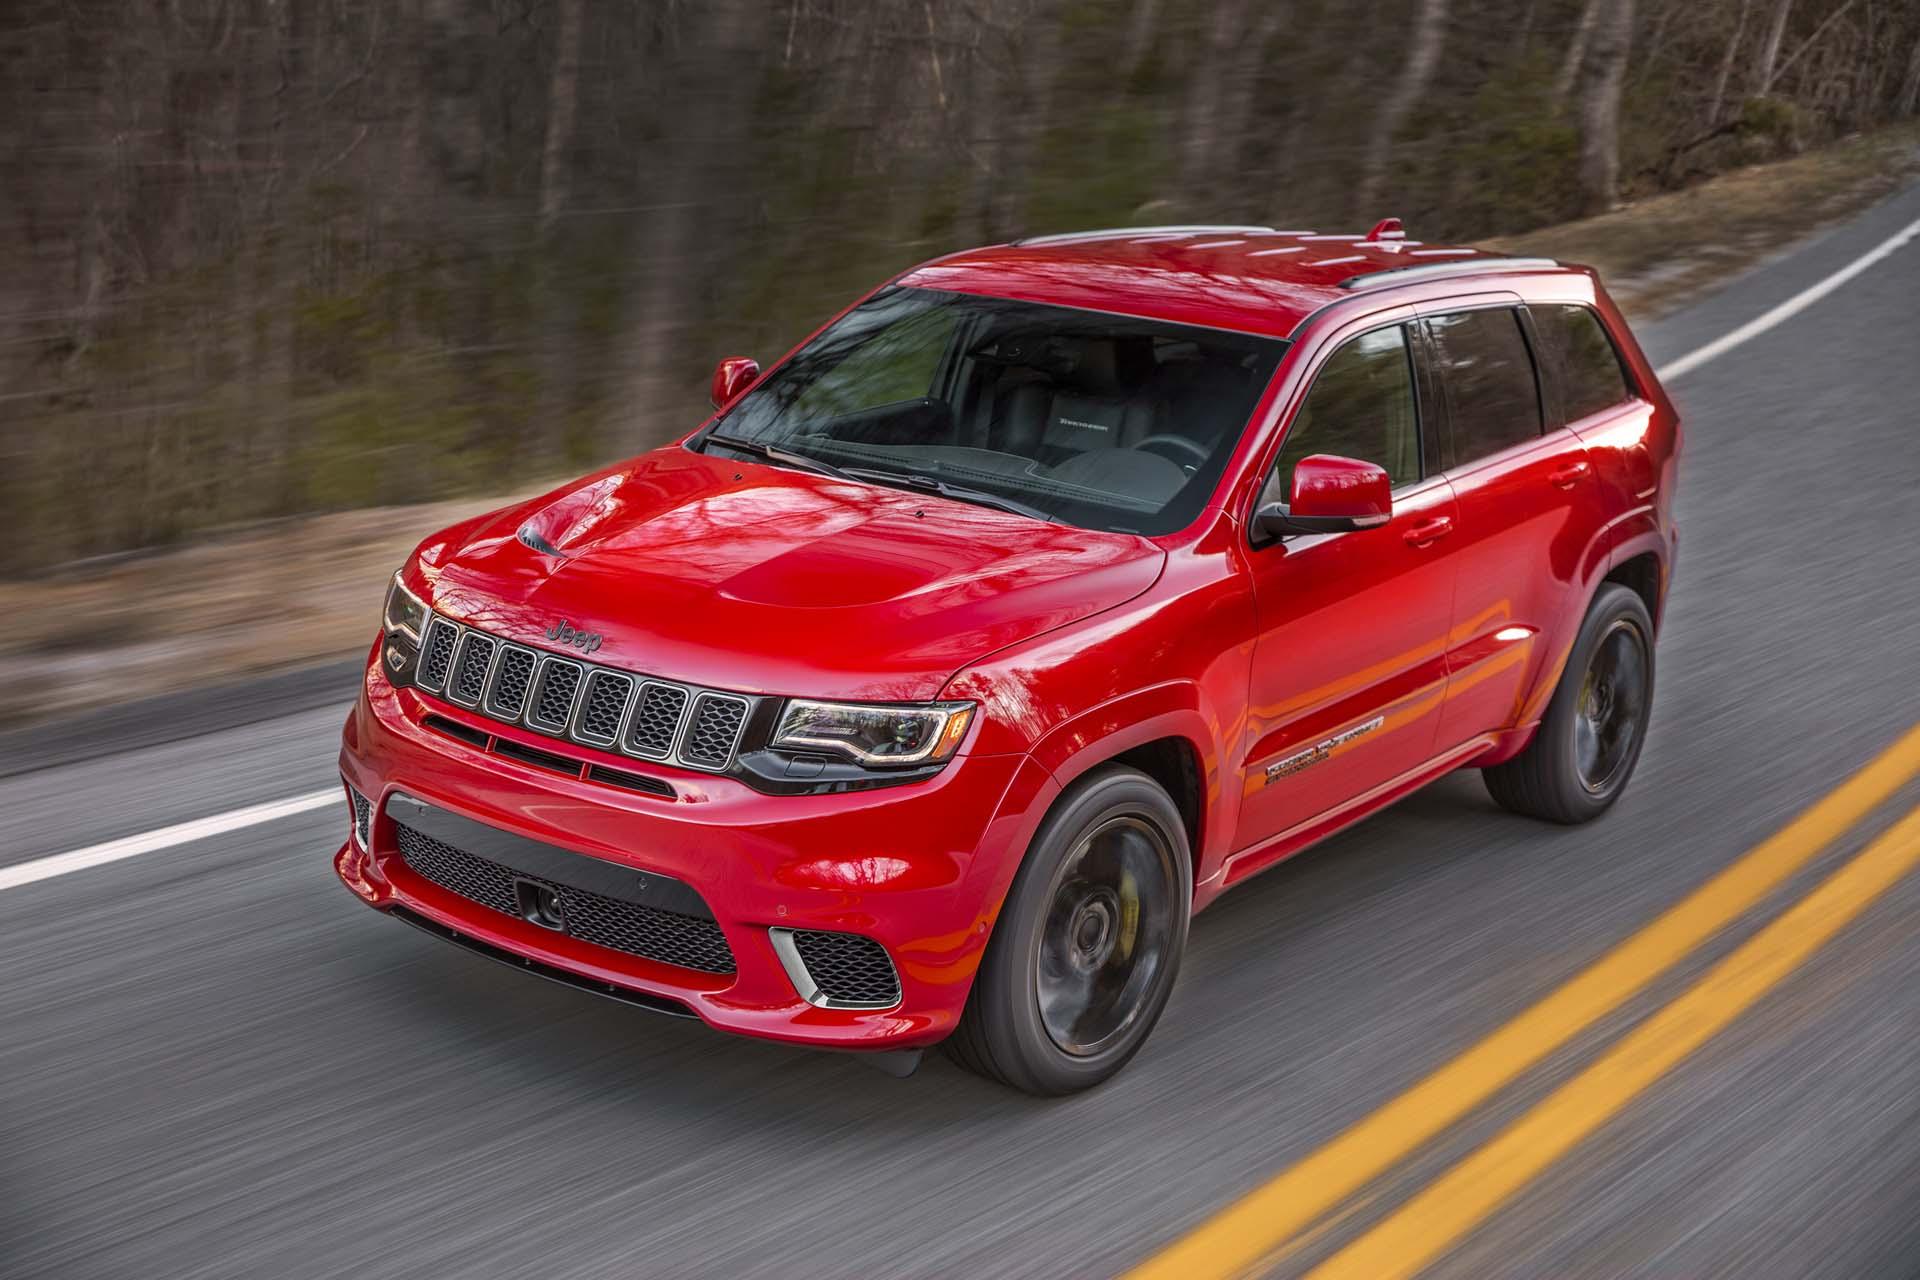 2019 Jeep Grand Cherokee wallpapers